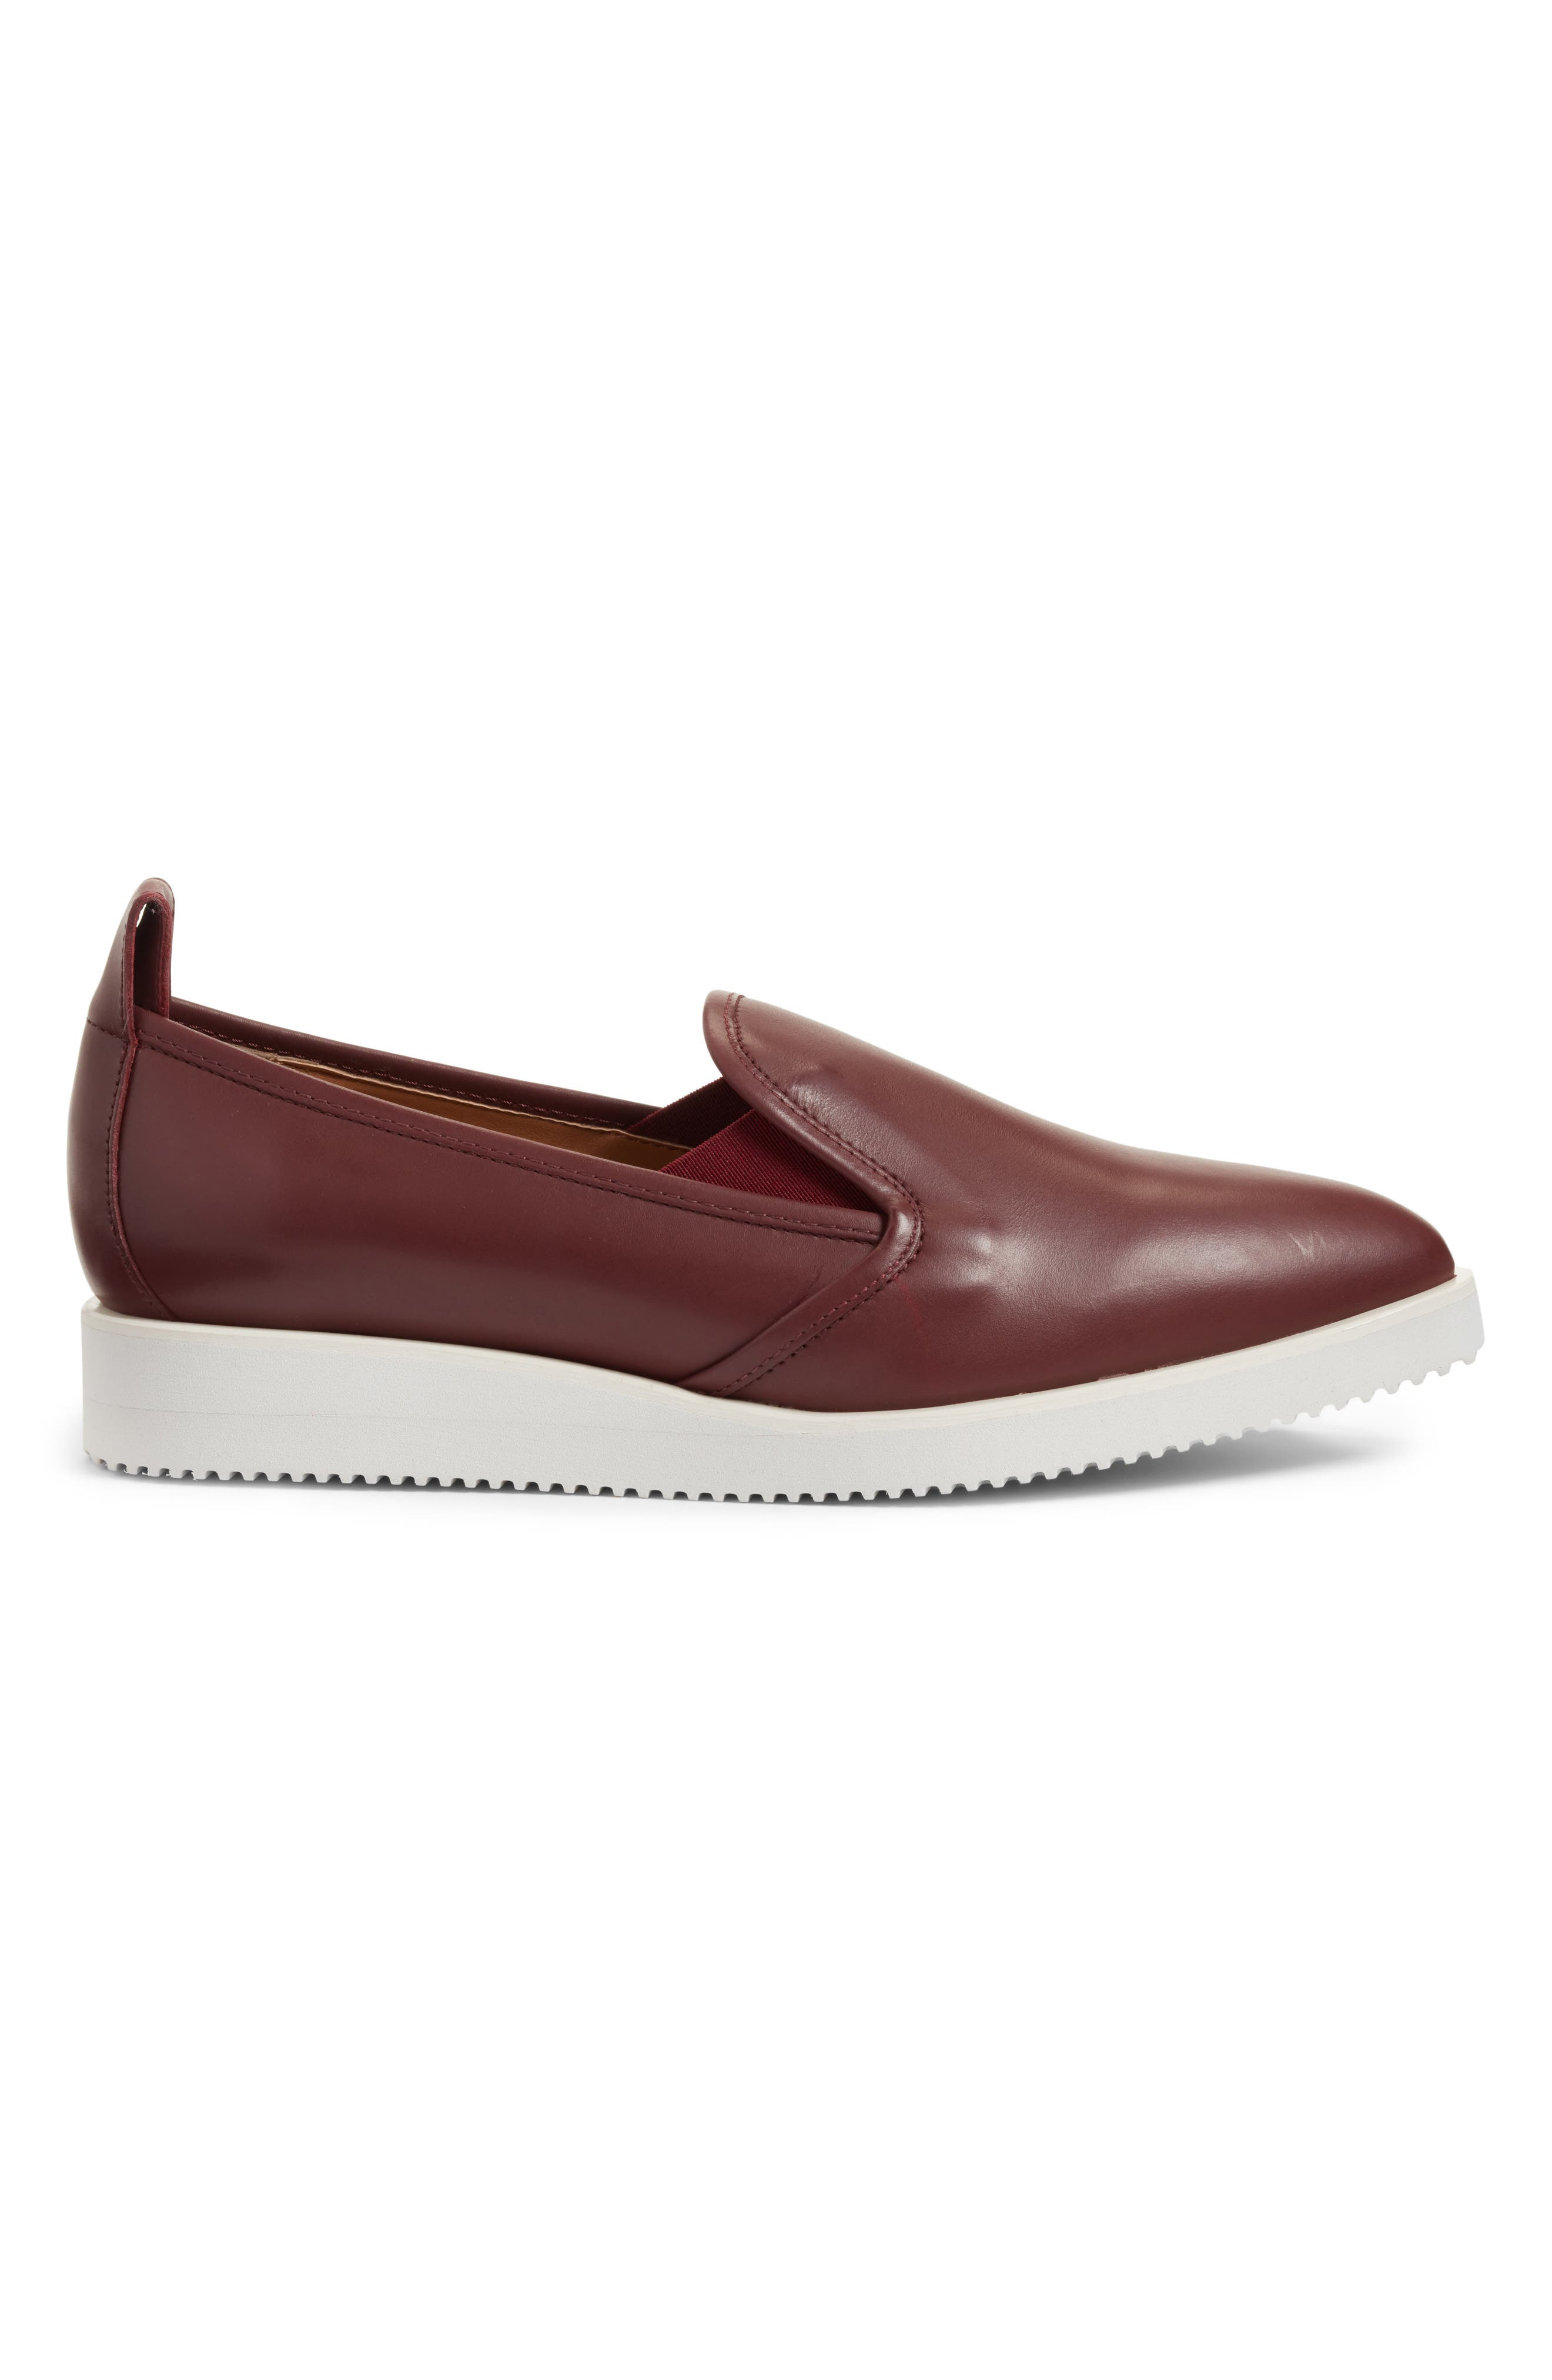 Alternate Image 3  - Everlane The Leather Street Shoe (Women)